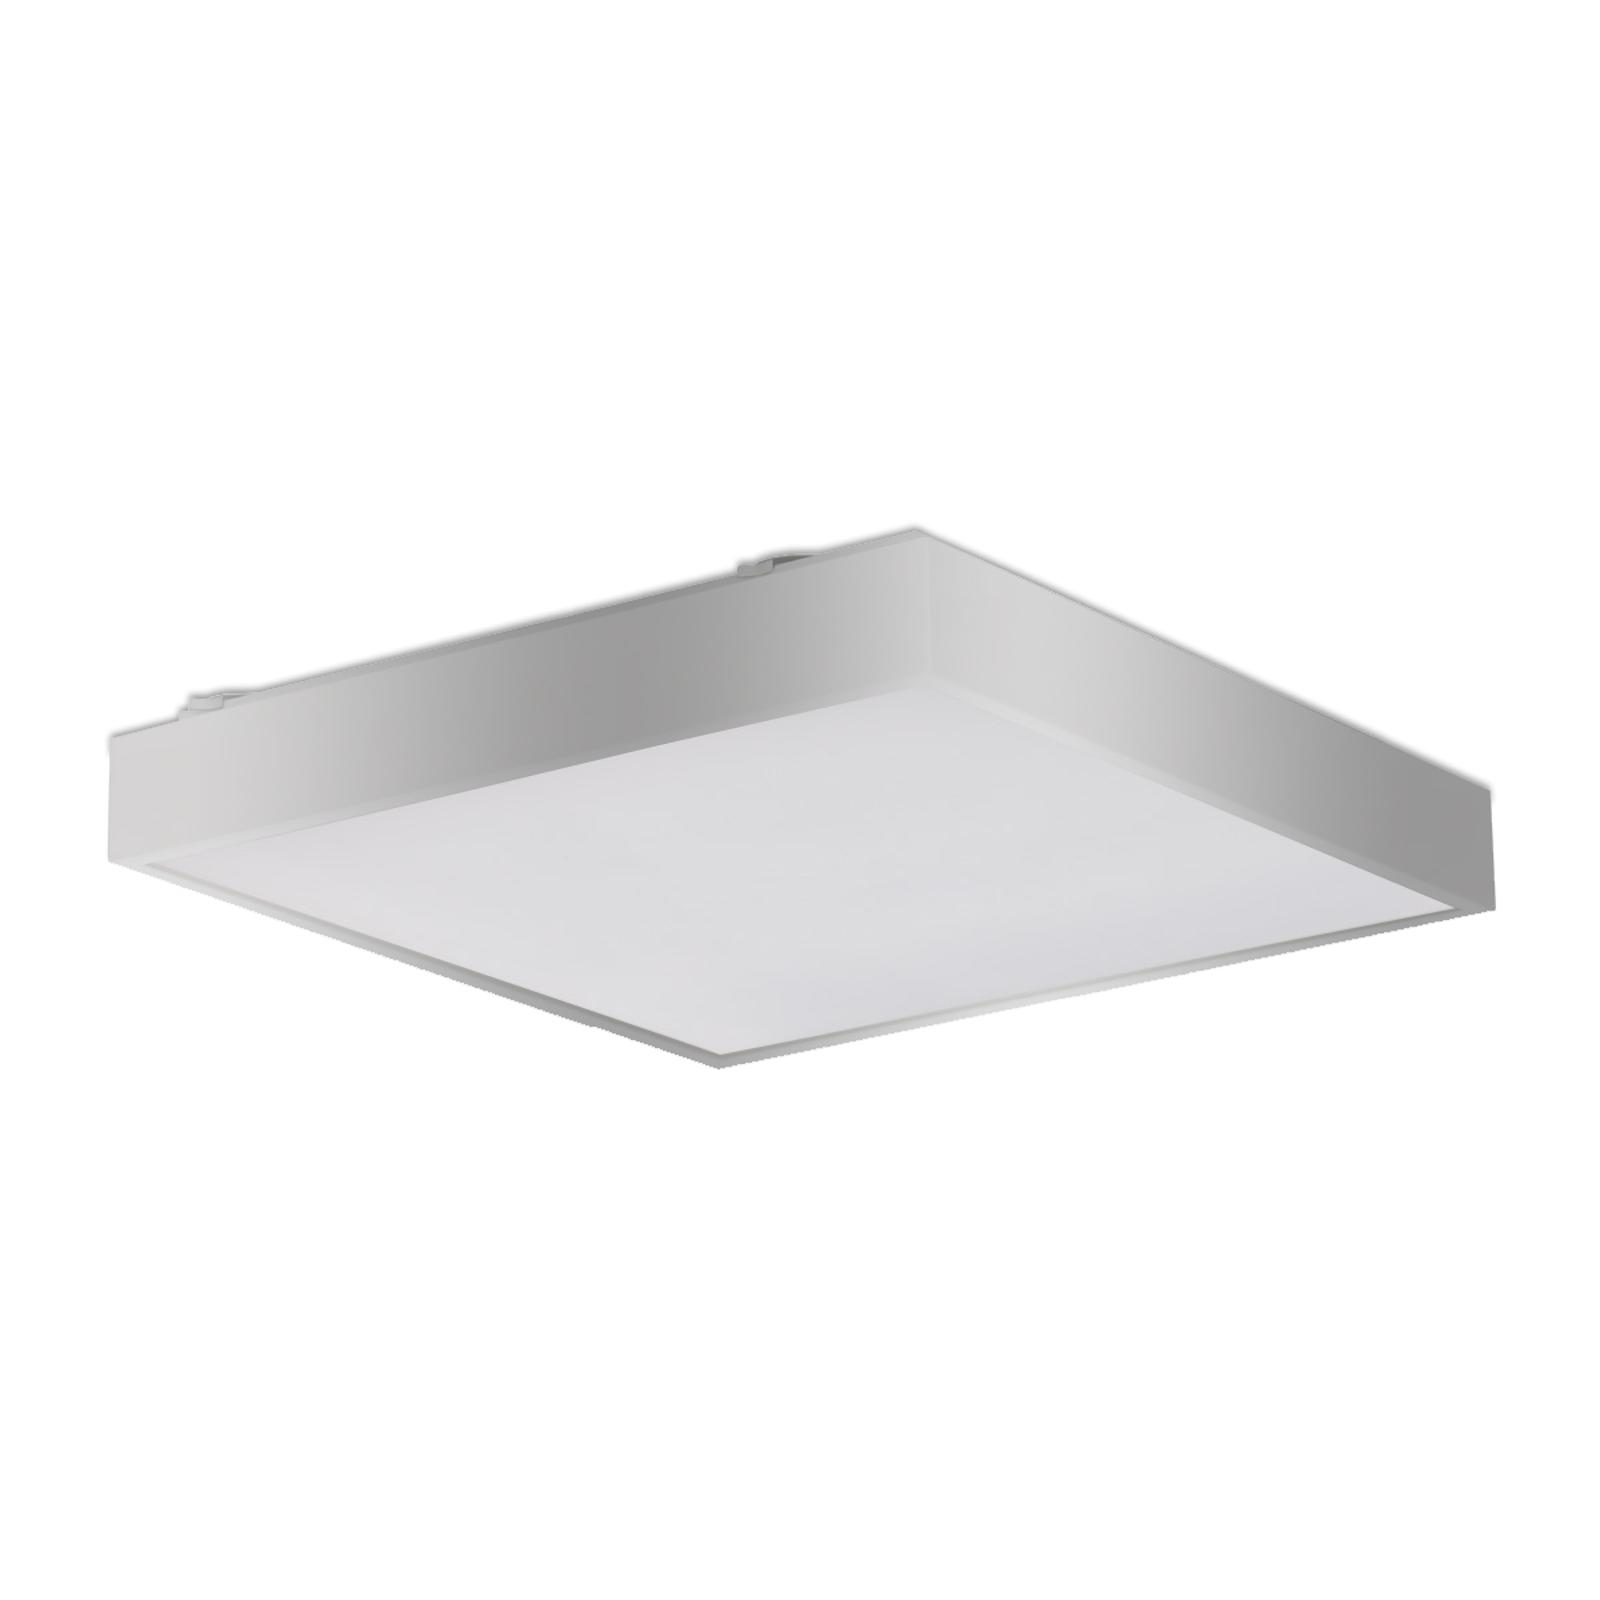 Led-plafondlamp Q5, zilverkleurig, EVA